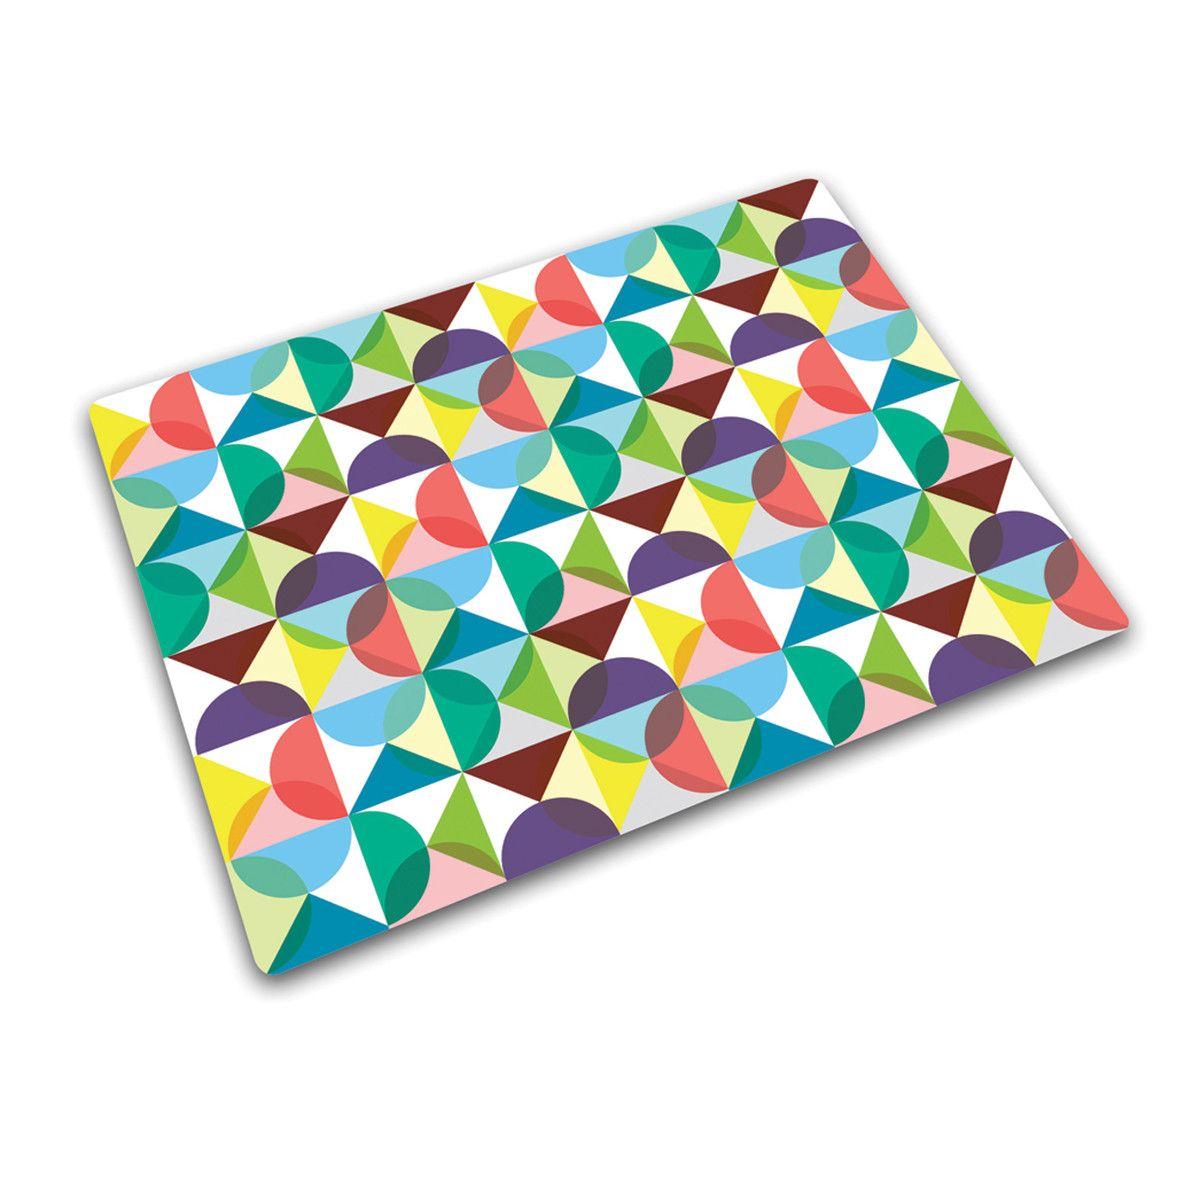 Geometric Worktop Saver by Joseph Joseph | Products I Love | Pinterest